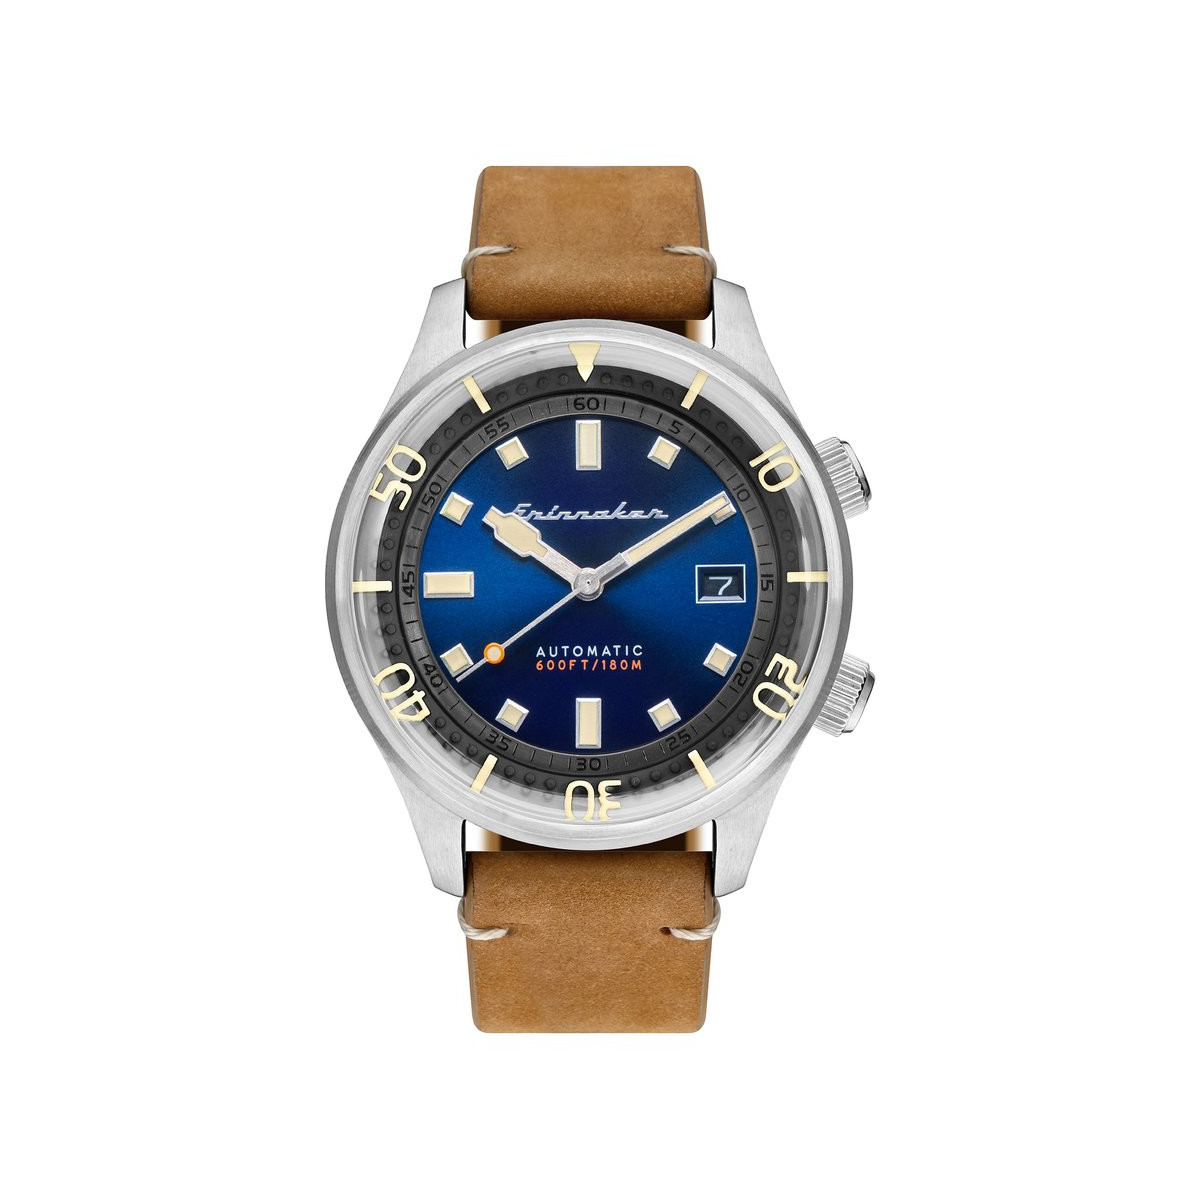 Montre Spinnaker BRADNER Automatique - Cadran Bleu - SP-5062-05